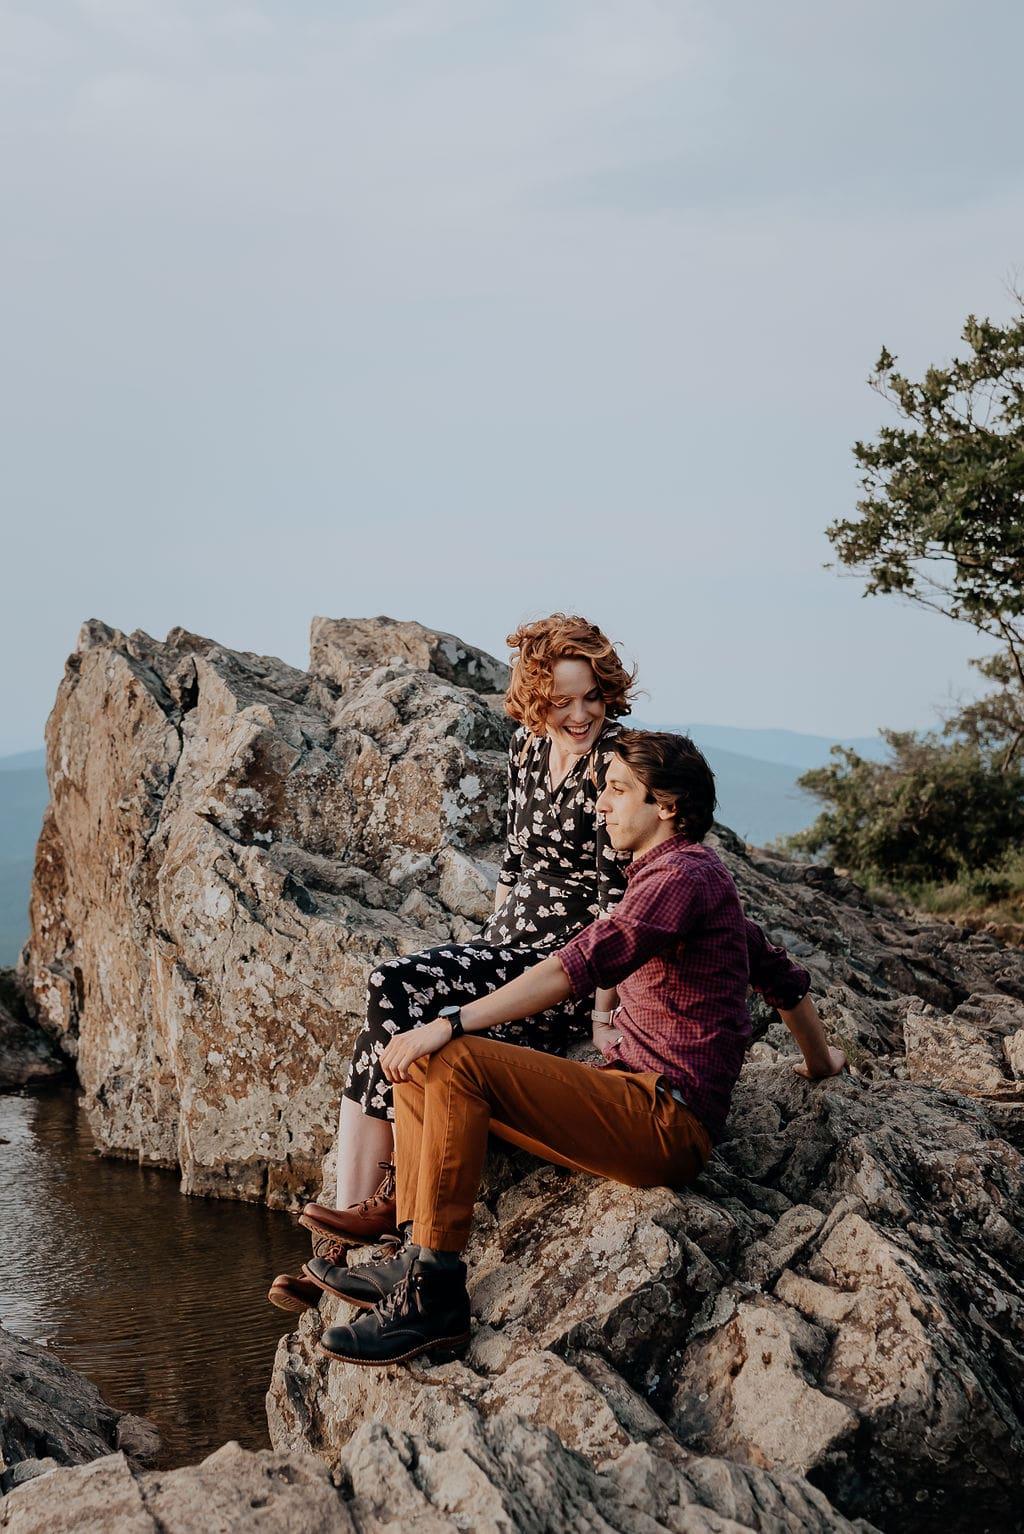 Jess-and-Amir_Shenandoah-AdventureSession-Flit-Photography-48-min